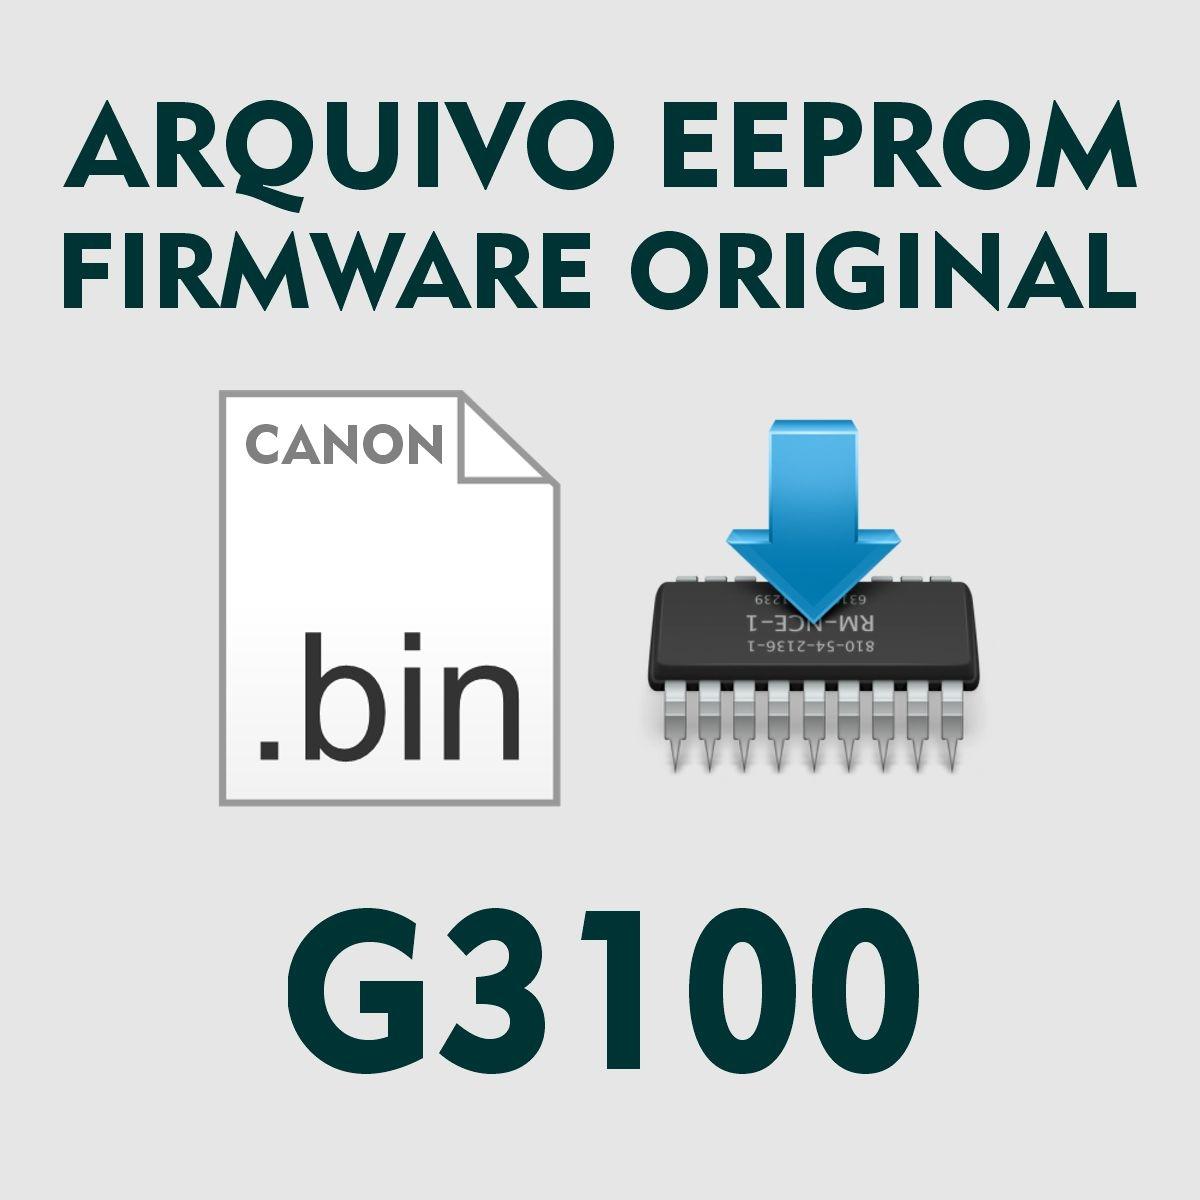 Canon G3100 | Arquivo de Eeprom Firmware .bin - Original